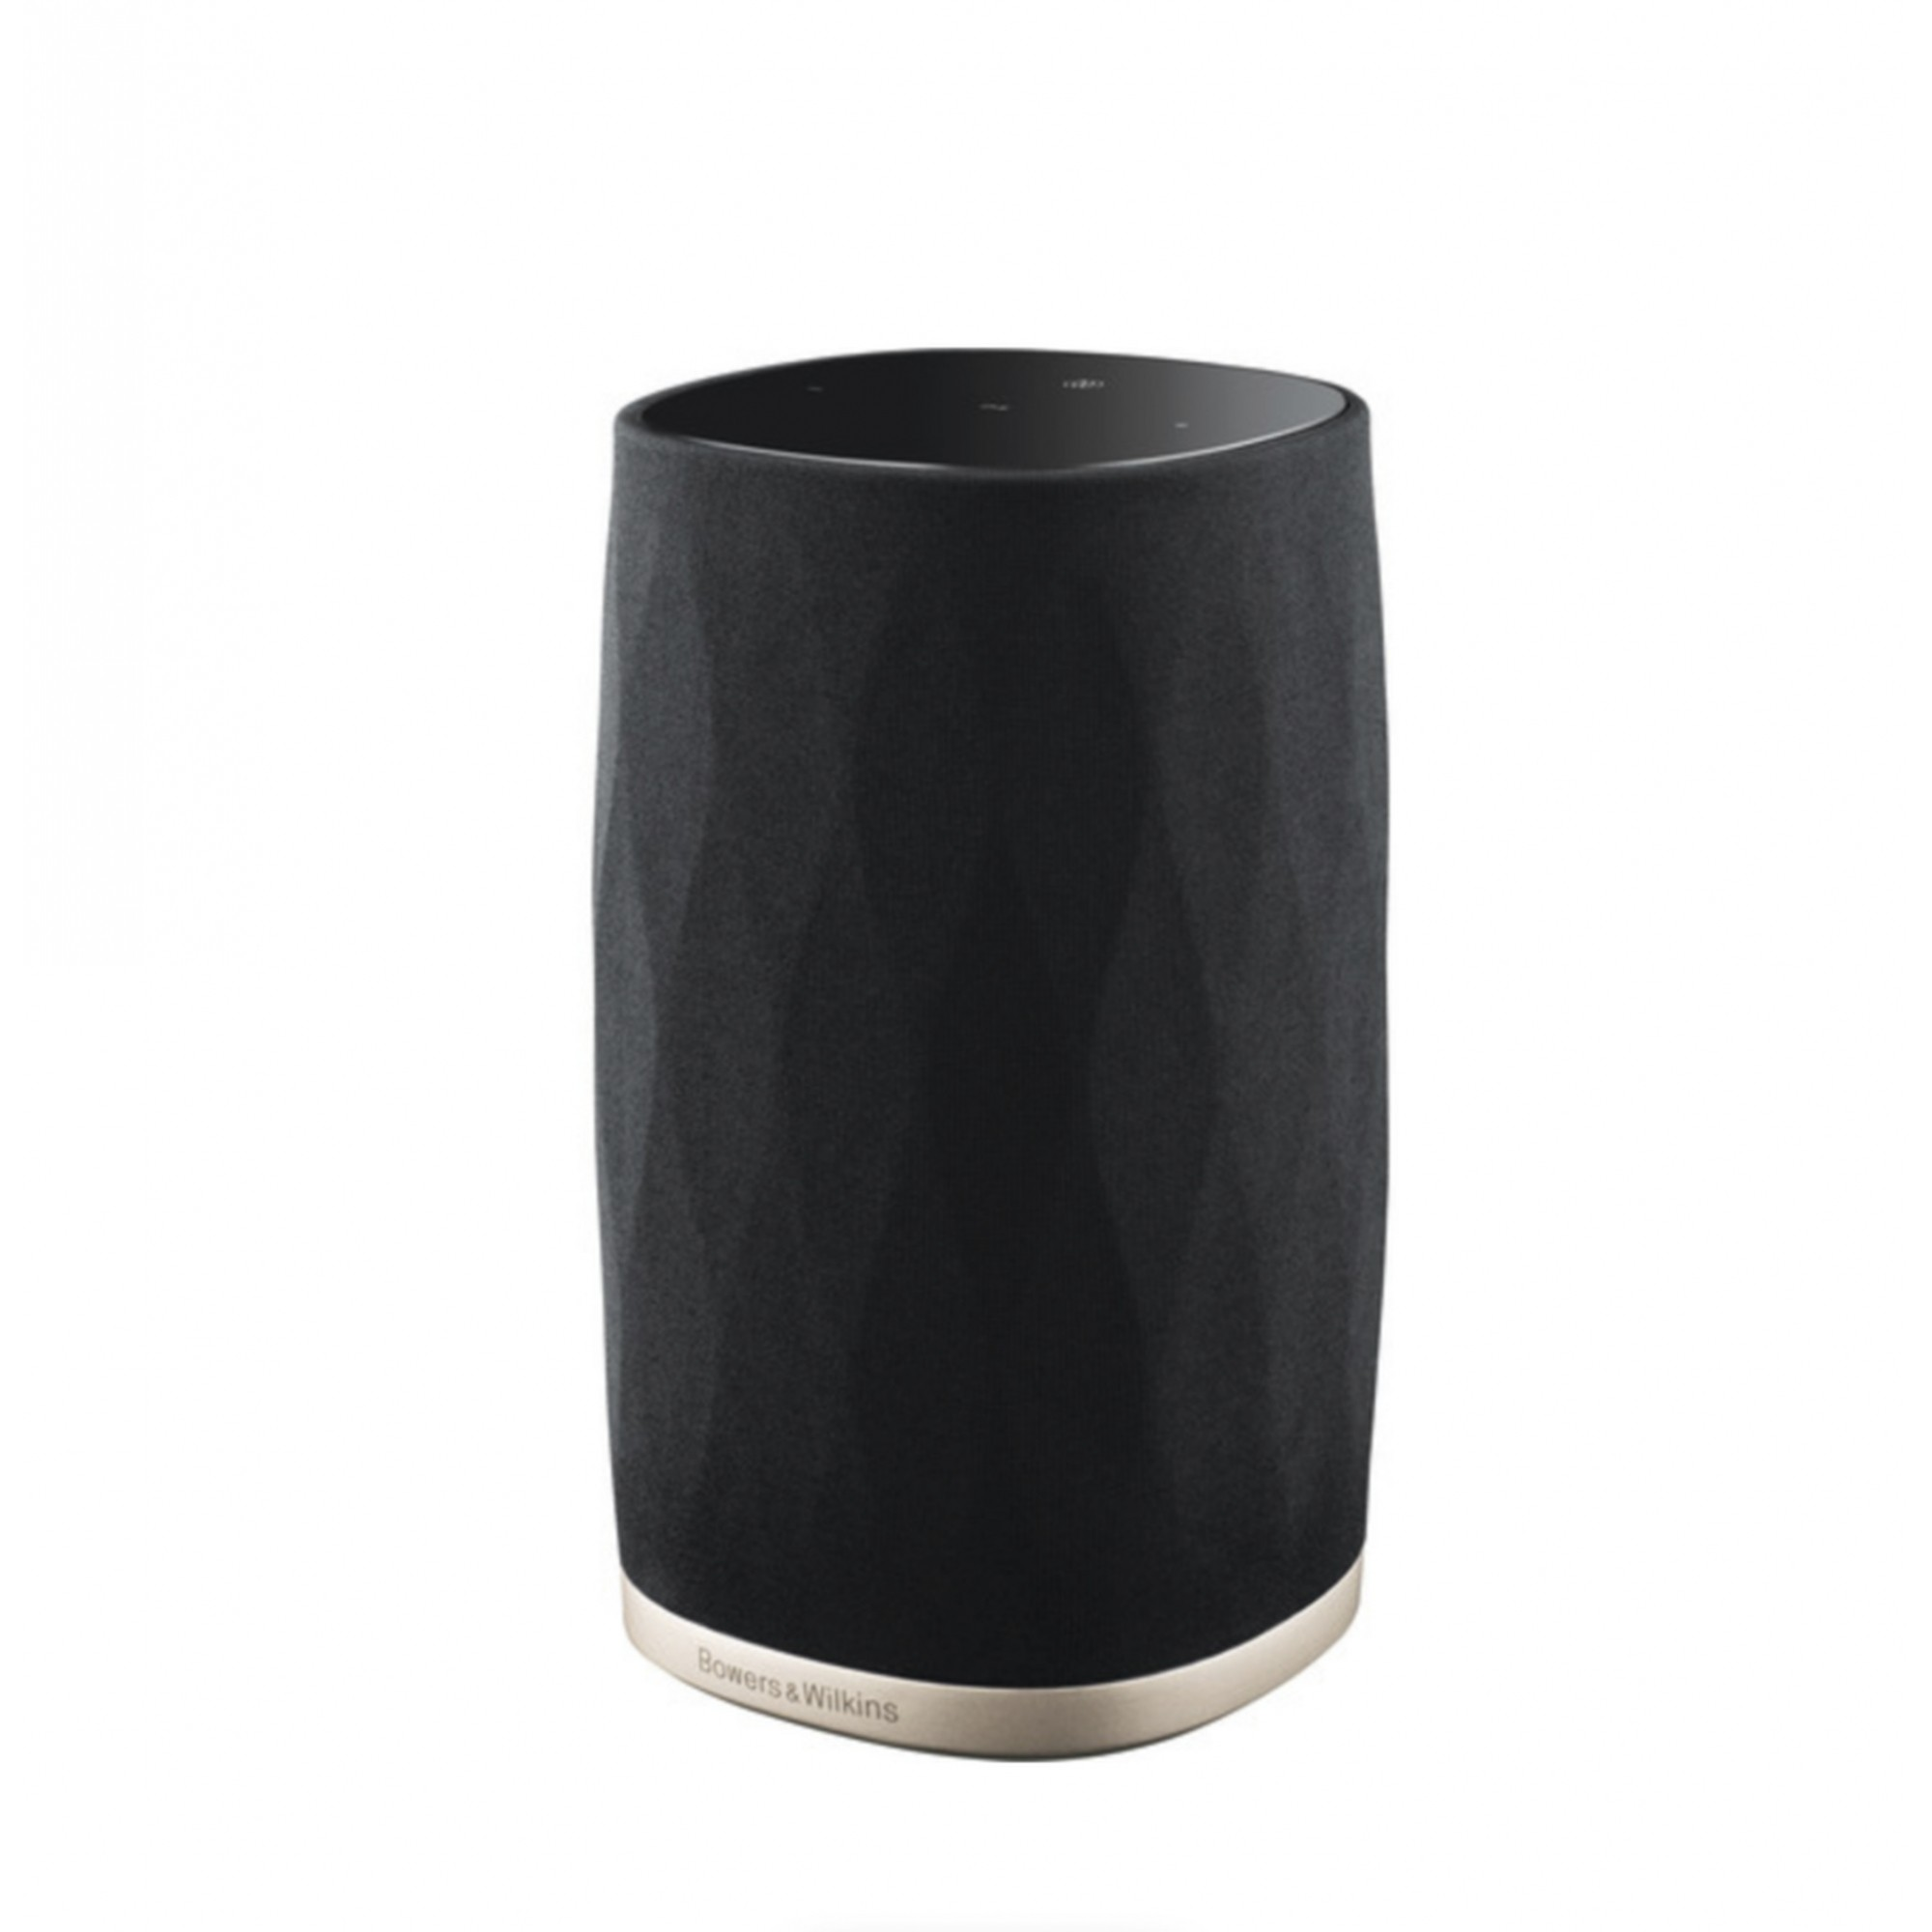 Bowers & Wilkins Formation Flex Wireless Speaker Unidade (black)